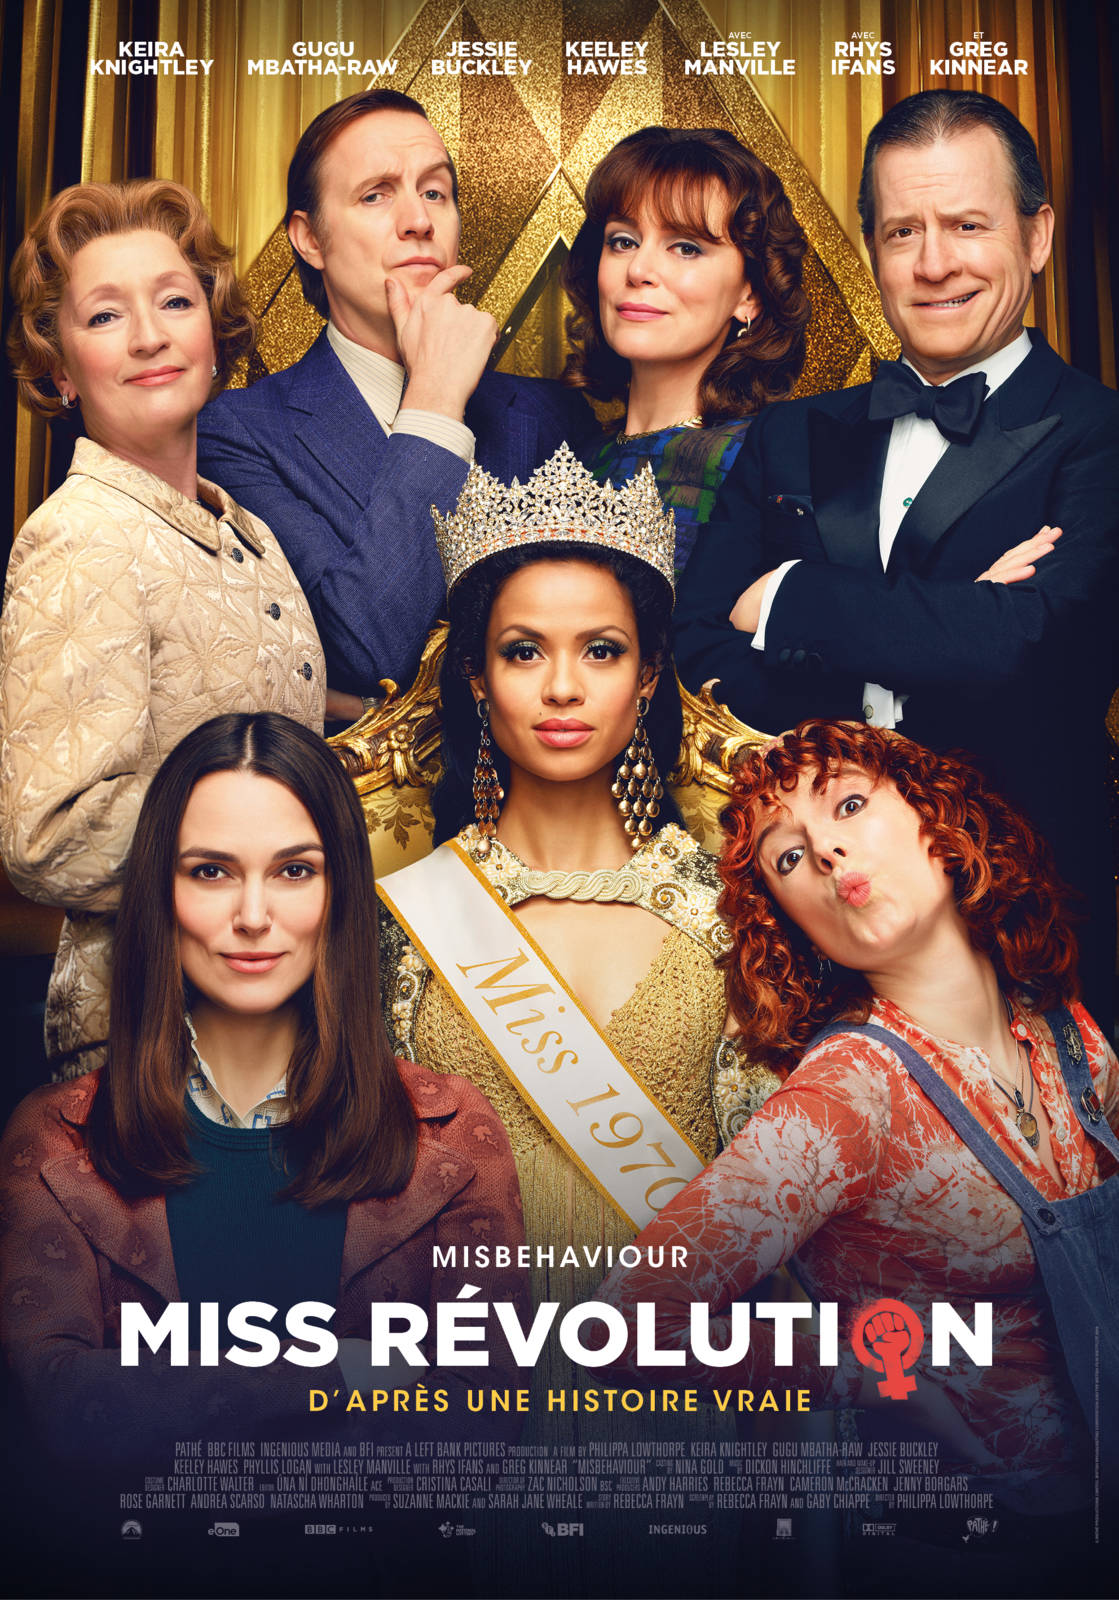 Miss Révolution - Misbehaviour